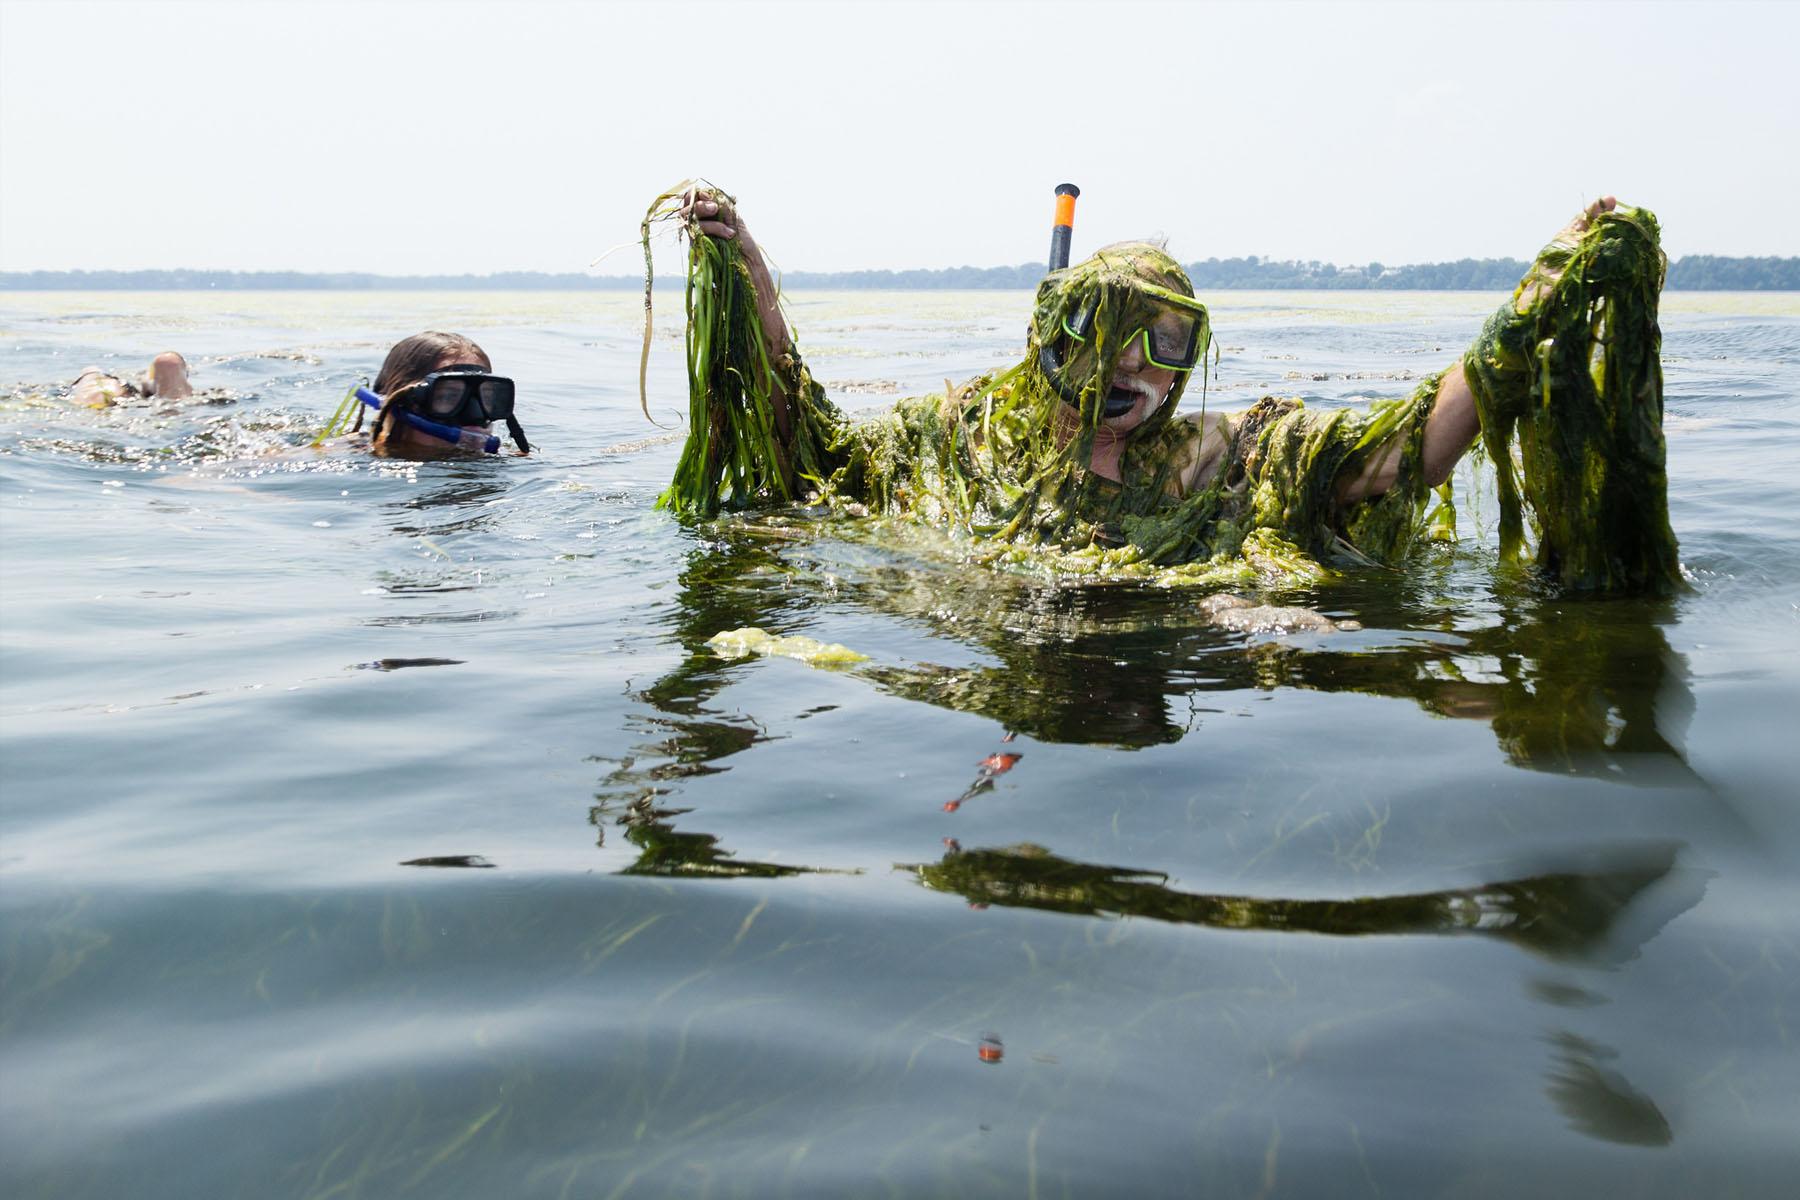 Image by Chesapeake Bay Program.